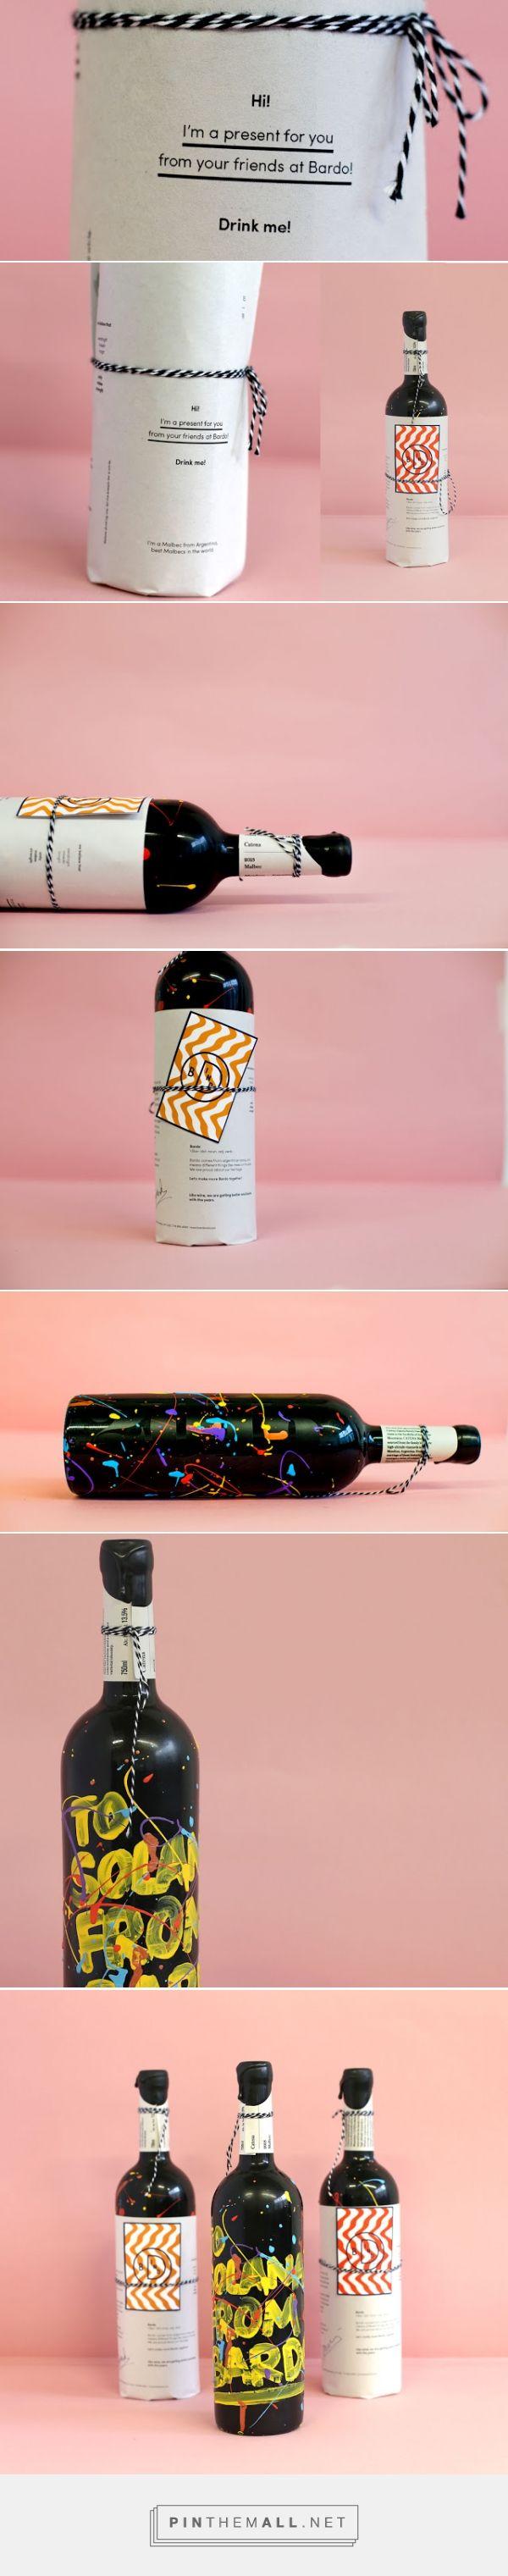 Cheers 2016! wine - Packaging of the World - Creative Package Design Gallery - http://www.packagingoftheworld.com/2016/01/cheers-2016.html